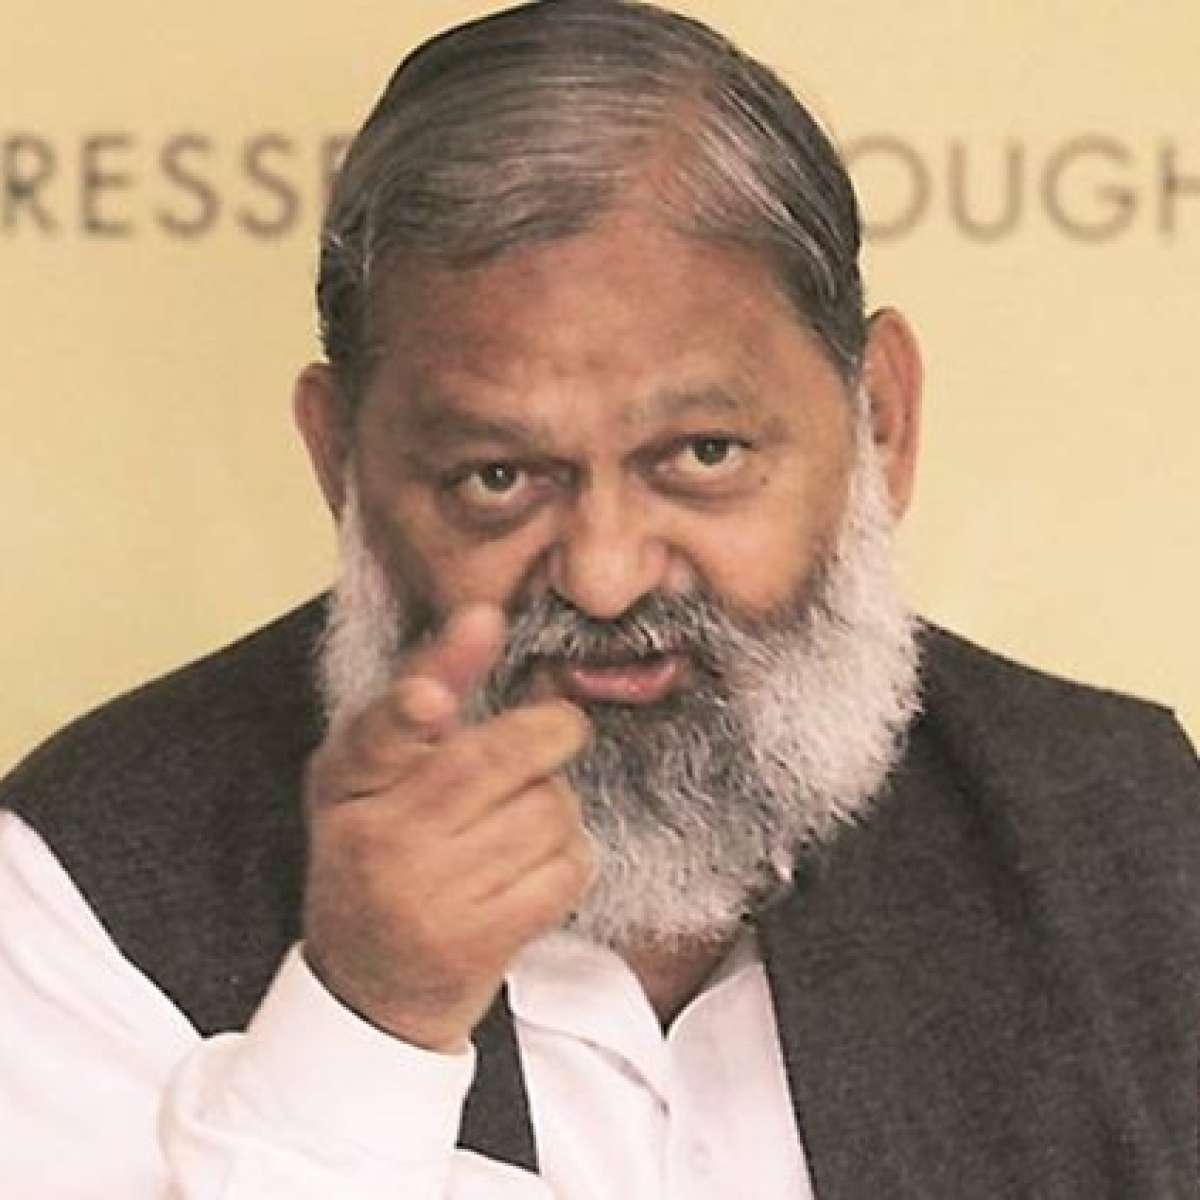 'Wherever they go they ignite fire': Haryana minister Anil Vij calls Priyanka and Rahul 'live petrol bombs'